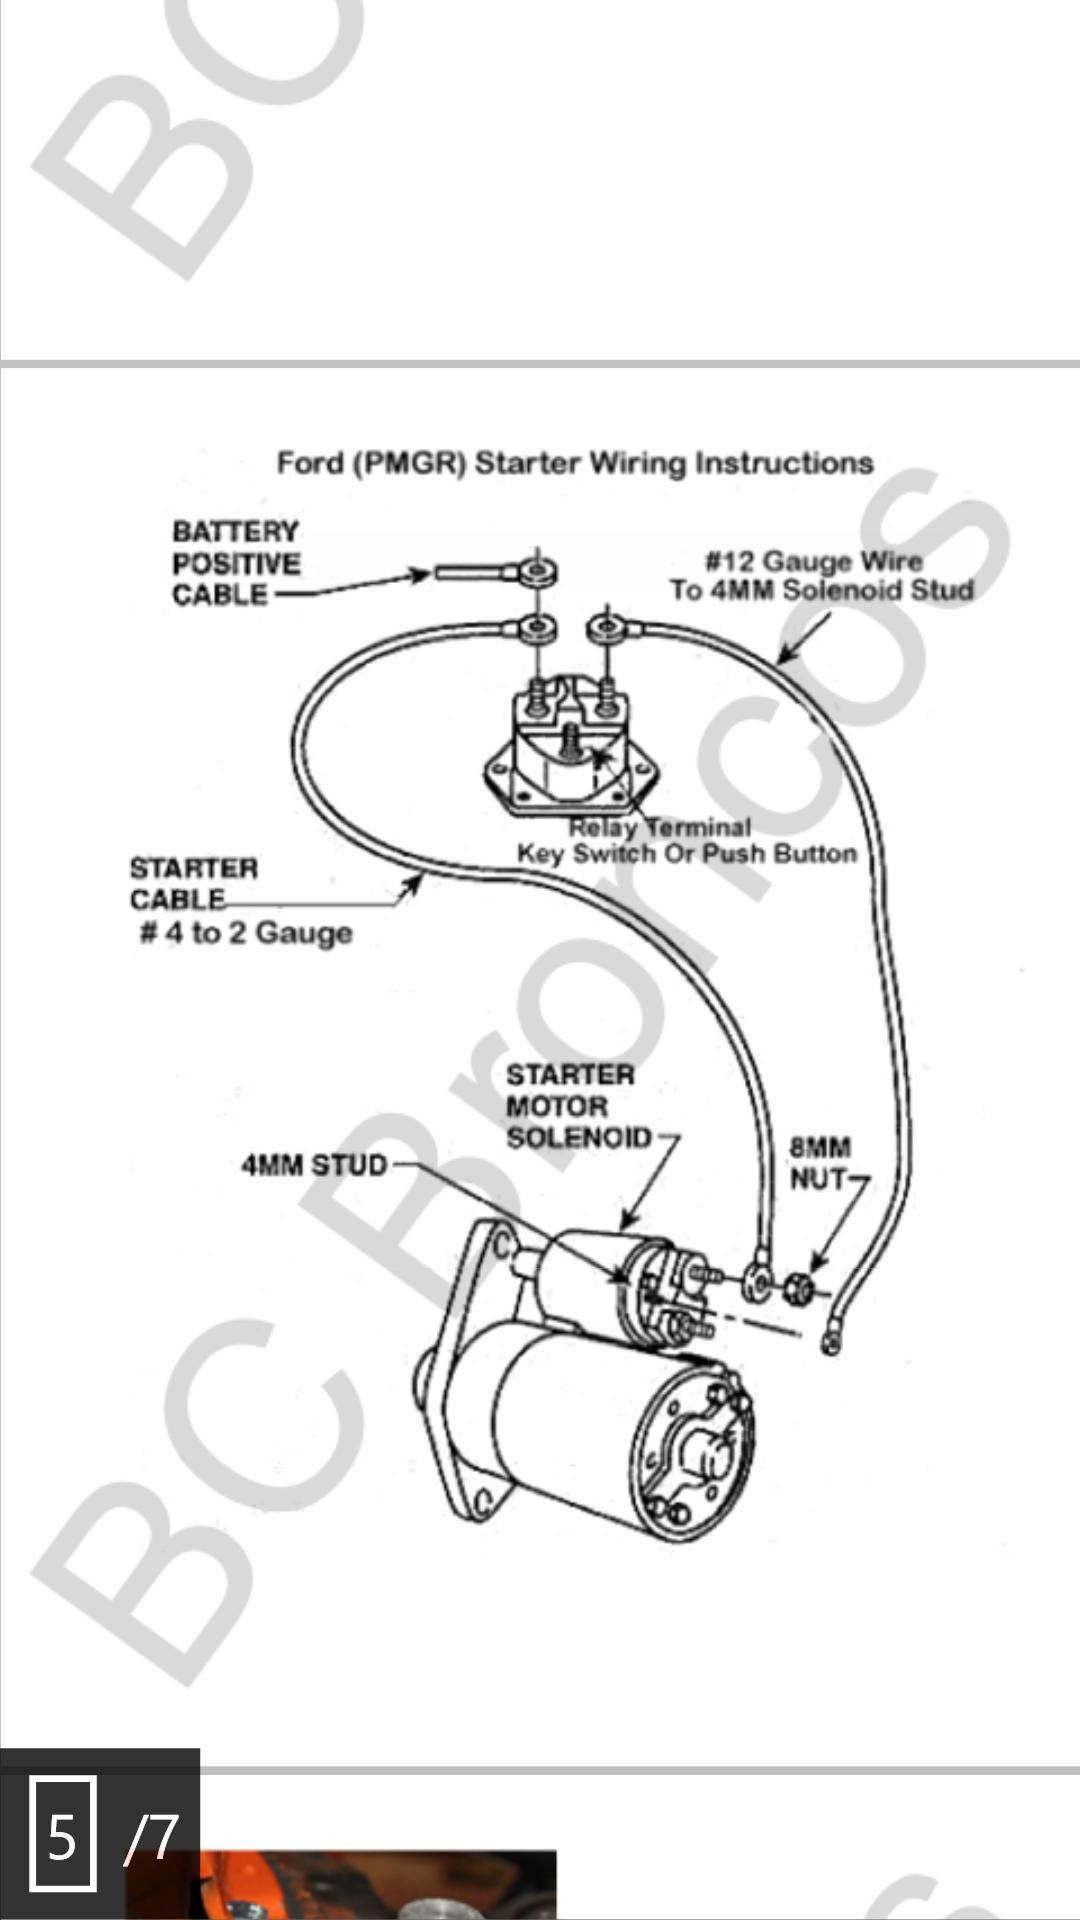 80-wp_ss_20150602_0004_332b957588d7244f7e3eb70ec92343c1427bd474  F Wiring Diagram Ford Truck on ford electrical wiring diagrams, ford e450 wiring diagrams, ford e-150 starter switch wiring, ford excursion wiring diagrams, ford headlight wiring diagram, ford probe wiring diagrams, ford f100 alternator wiring, ford fusion wiring diagrams, ford freestyle wiring diagrams, ford pickup wiring diagrams, ford wiring schematic, ford courier wiring diagrams, ford ranchero wiring diagrams, ford f100 radio wiring, ford explorer sport trac wiring diagrams, ford wiring harness diagrams, ford econoline wiring diagrams, ford f150 wiring diagrams, ford f550 wiring diagrams, ford cop ignition wiring diagrams,